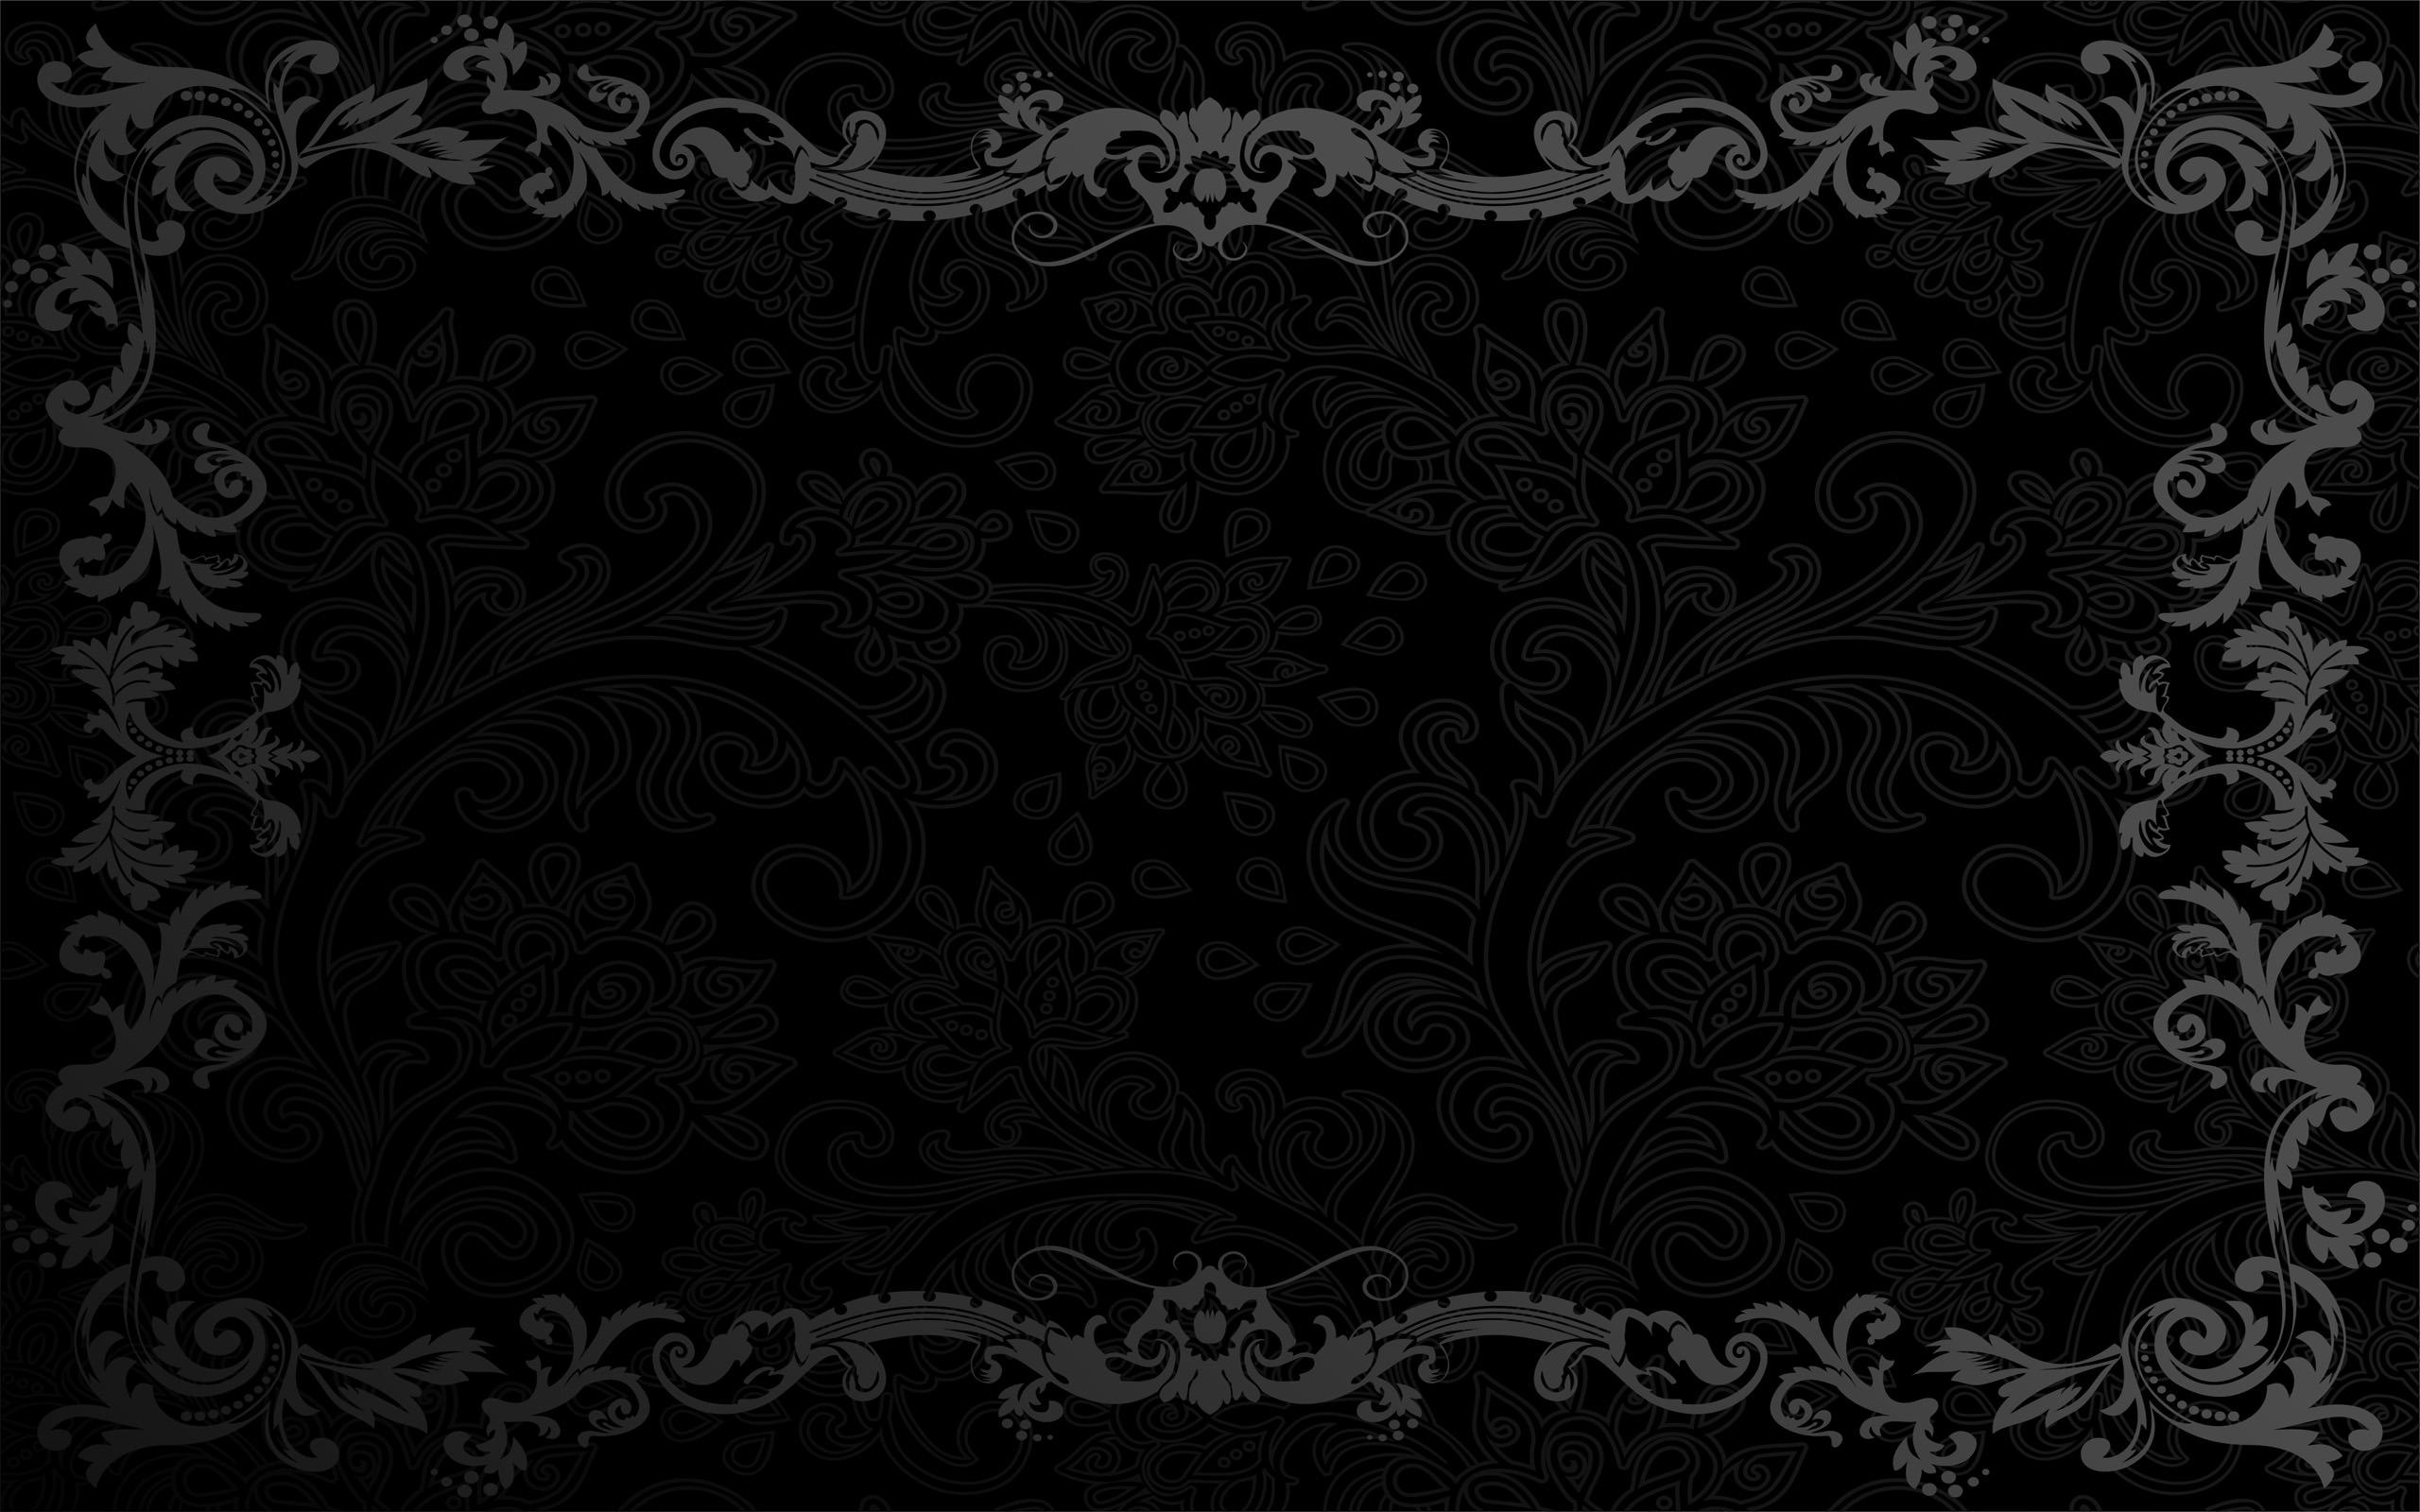 Black Wallpapers: 22+ Black Wallpapers, Dark, Backgrounds, Images